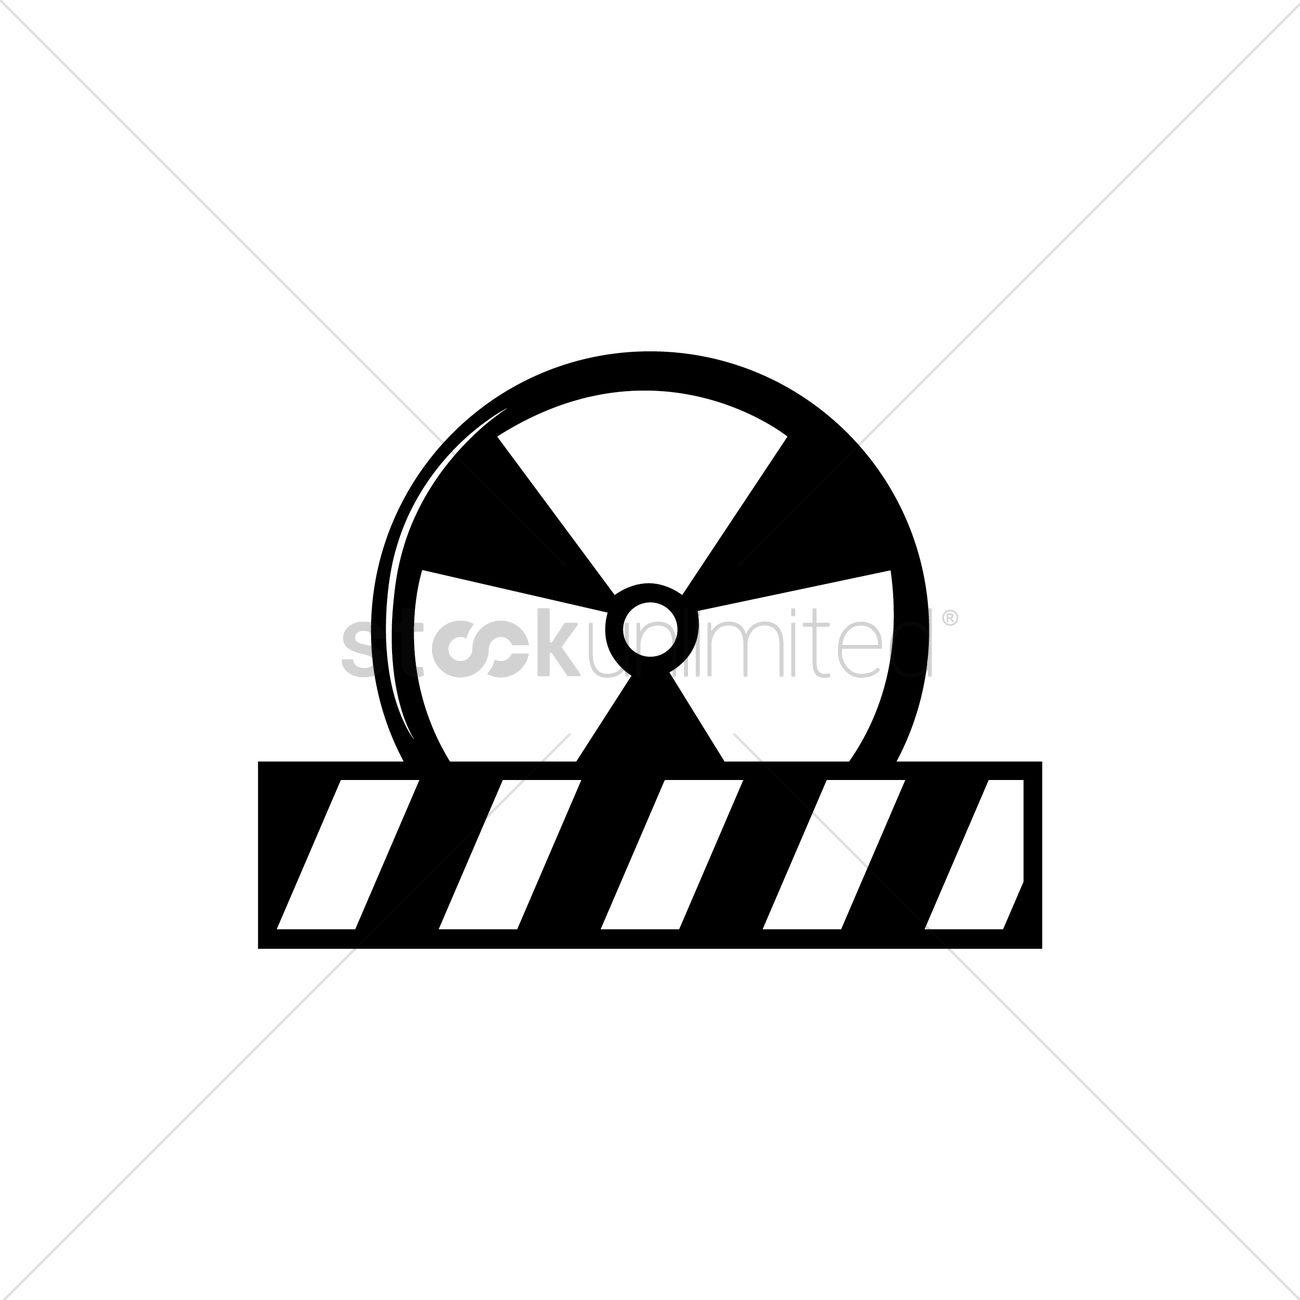 Radioactive symbol vector image 2016693 stockunlimited radioactive symbol vector graphic buycottarizona